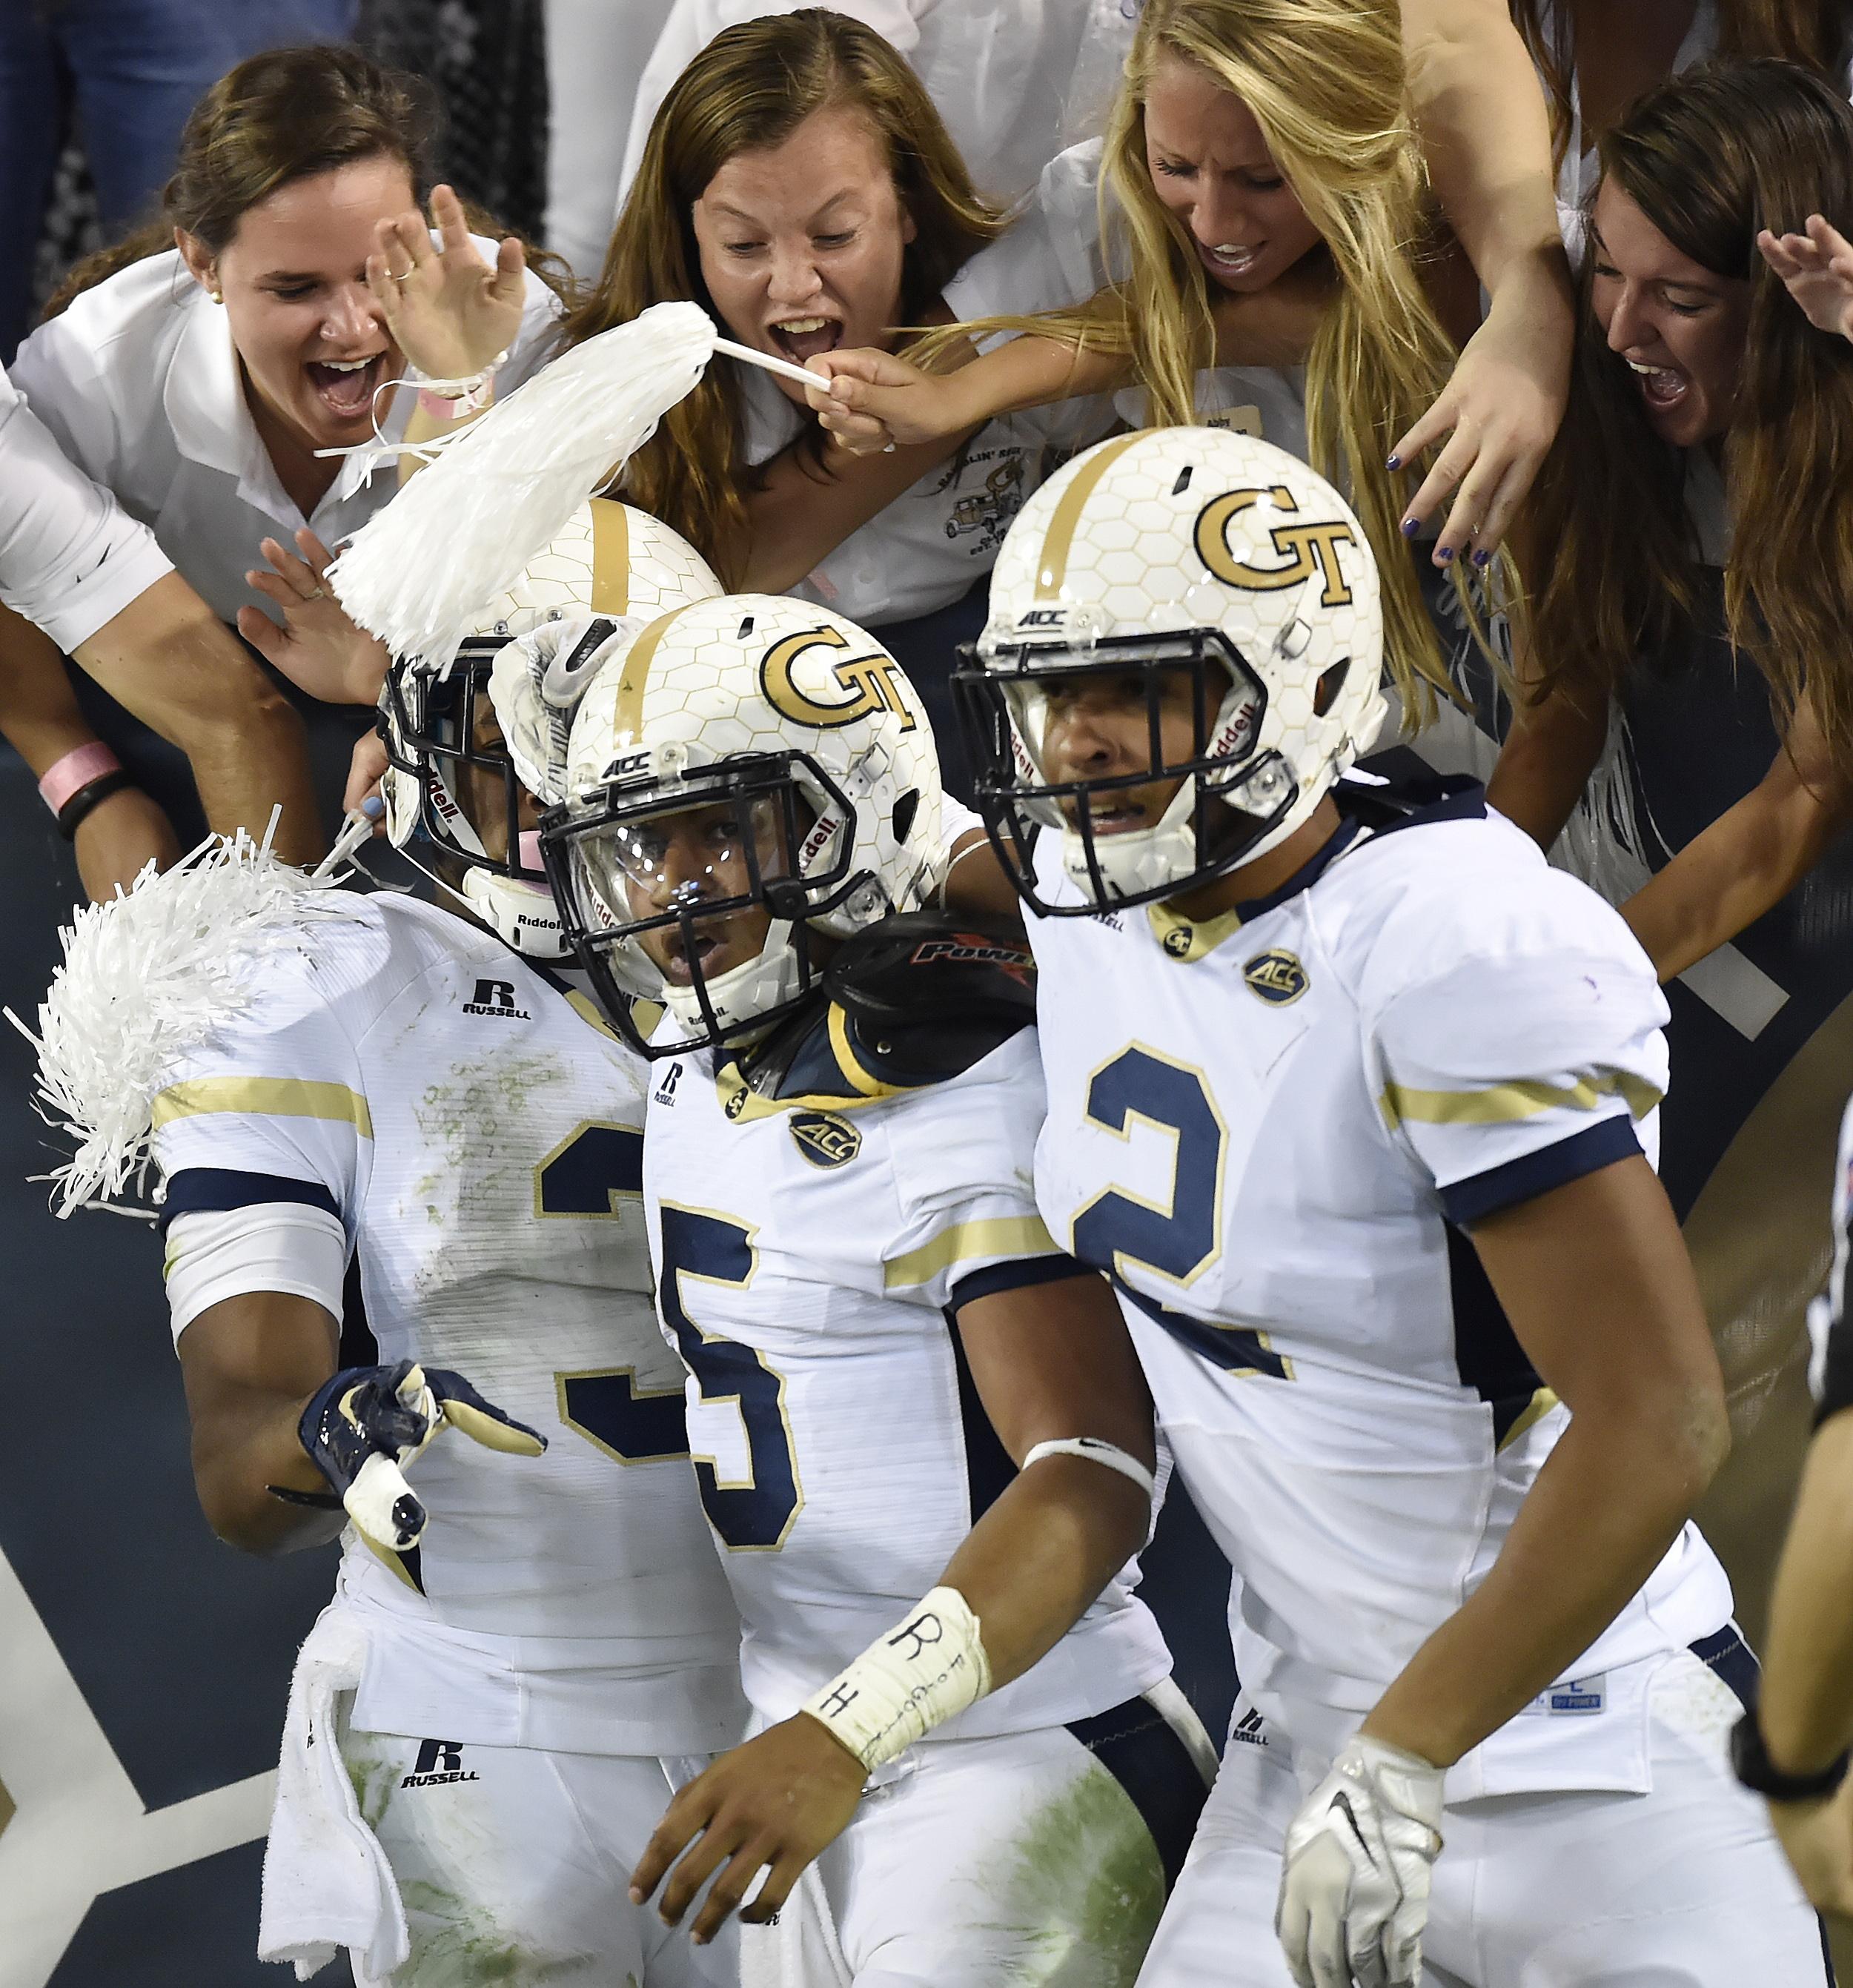 Georgia Tech quarterback Justin Thomas (5) celebrates his touchdown against Florida State during the first half of an NCAA college football game, Saturday, Oct. 24, 2015, in Atlanta. (AP Photo/Jon Barash)